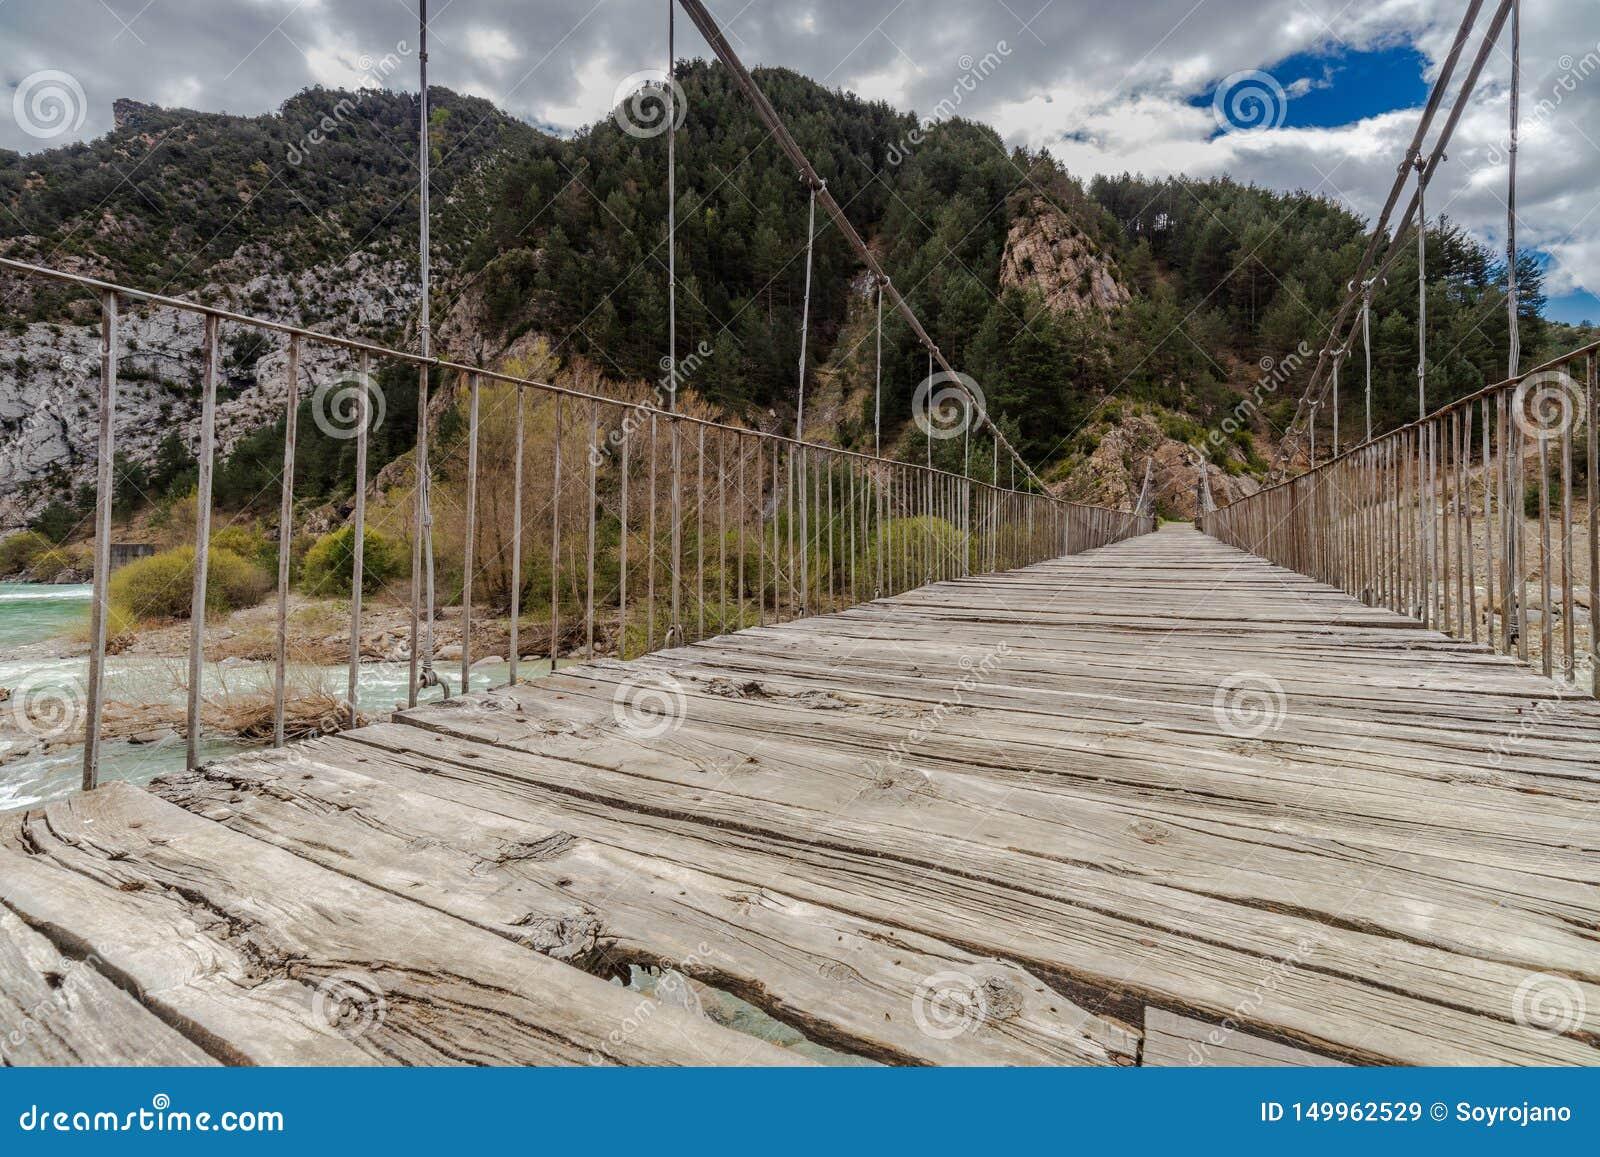 Suspension bridge over the wild river